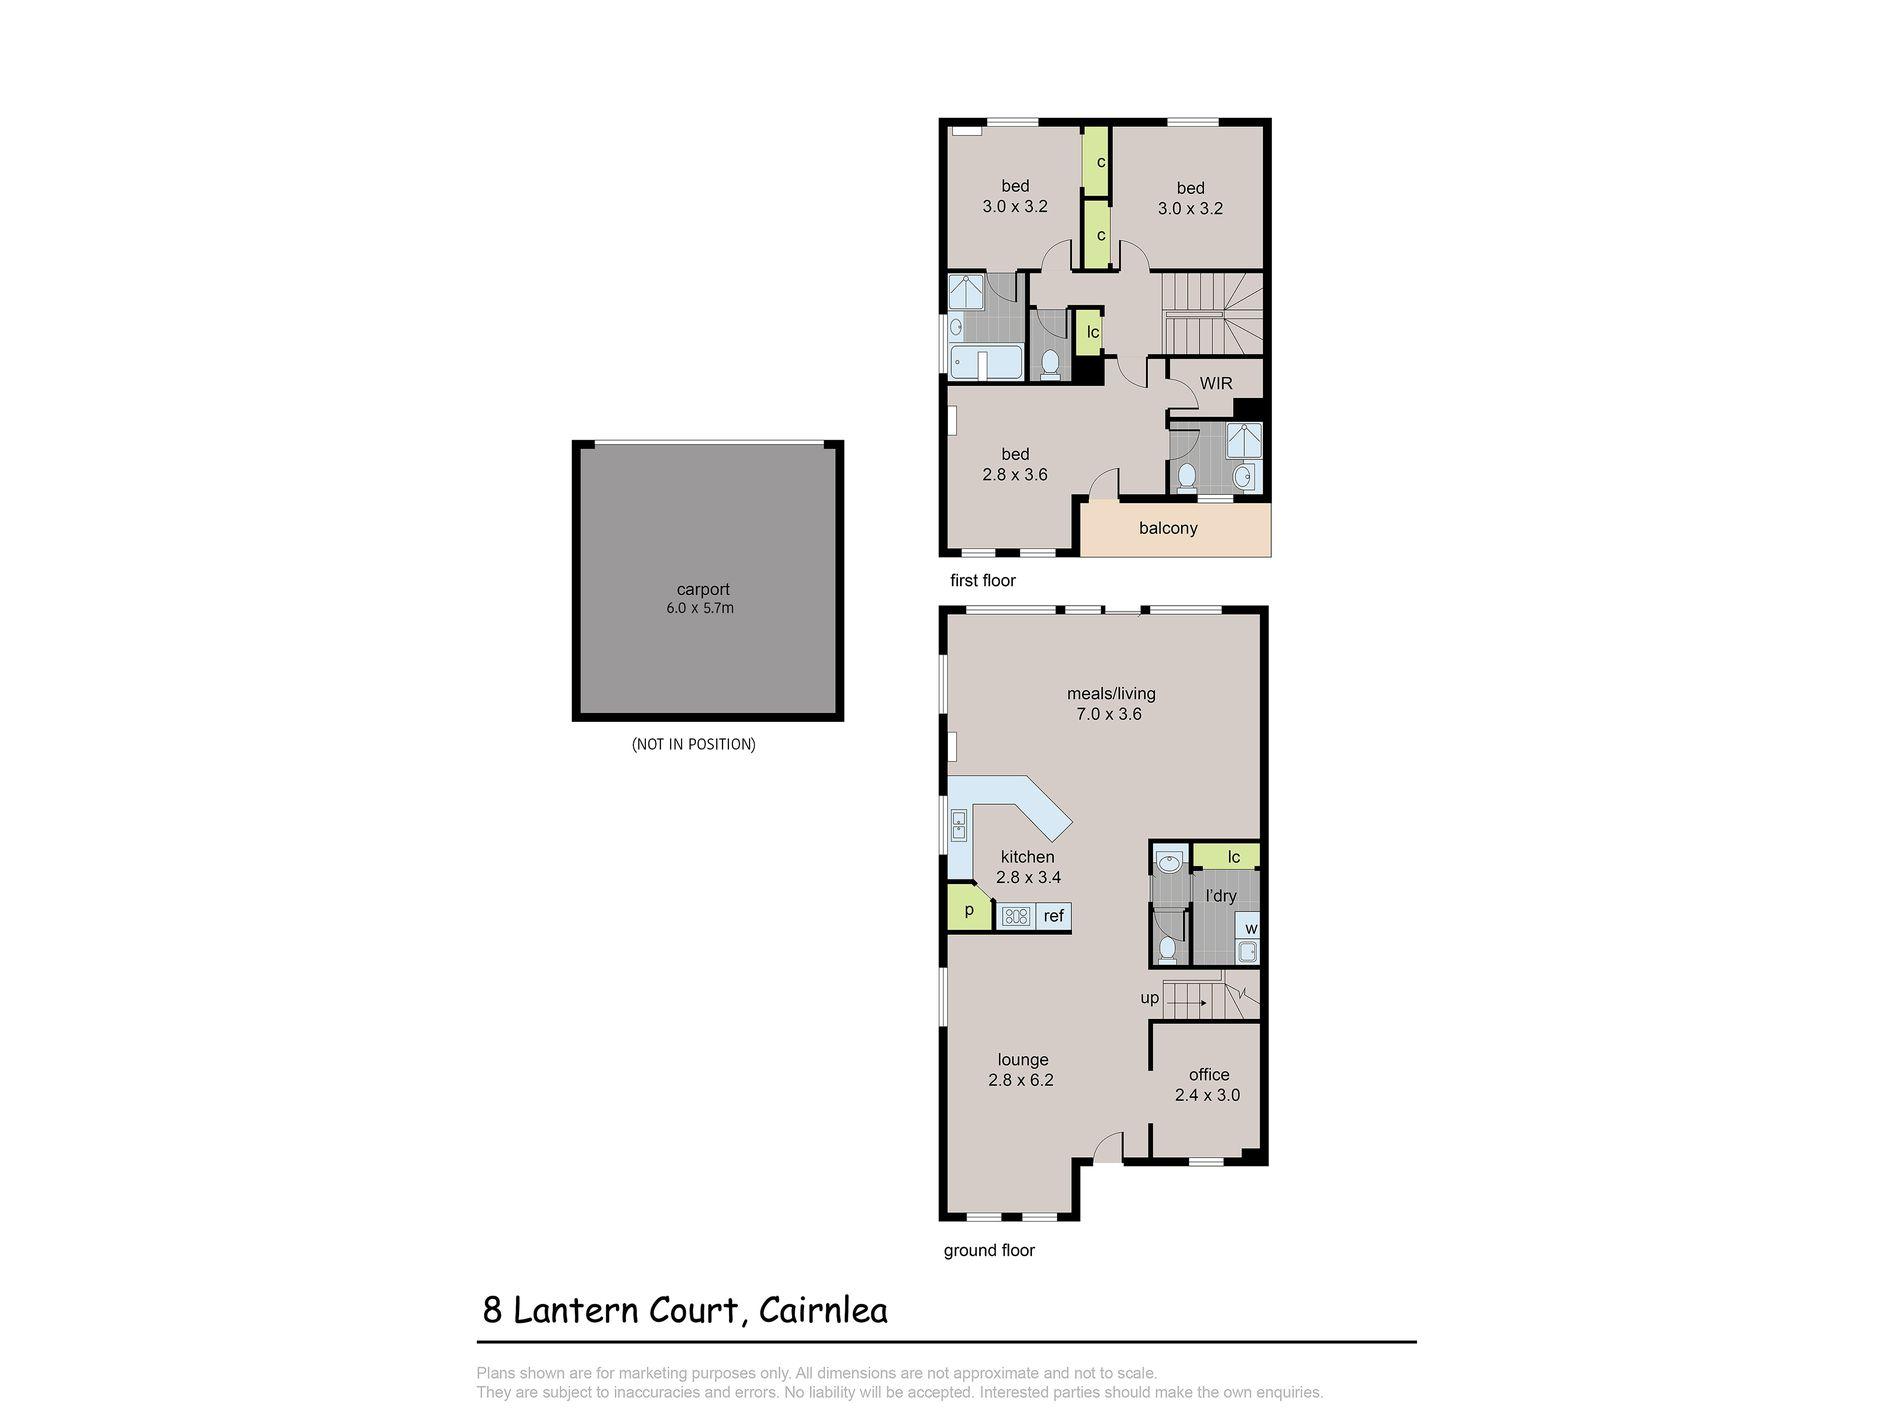 8 Lantern Court, Cairnlea